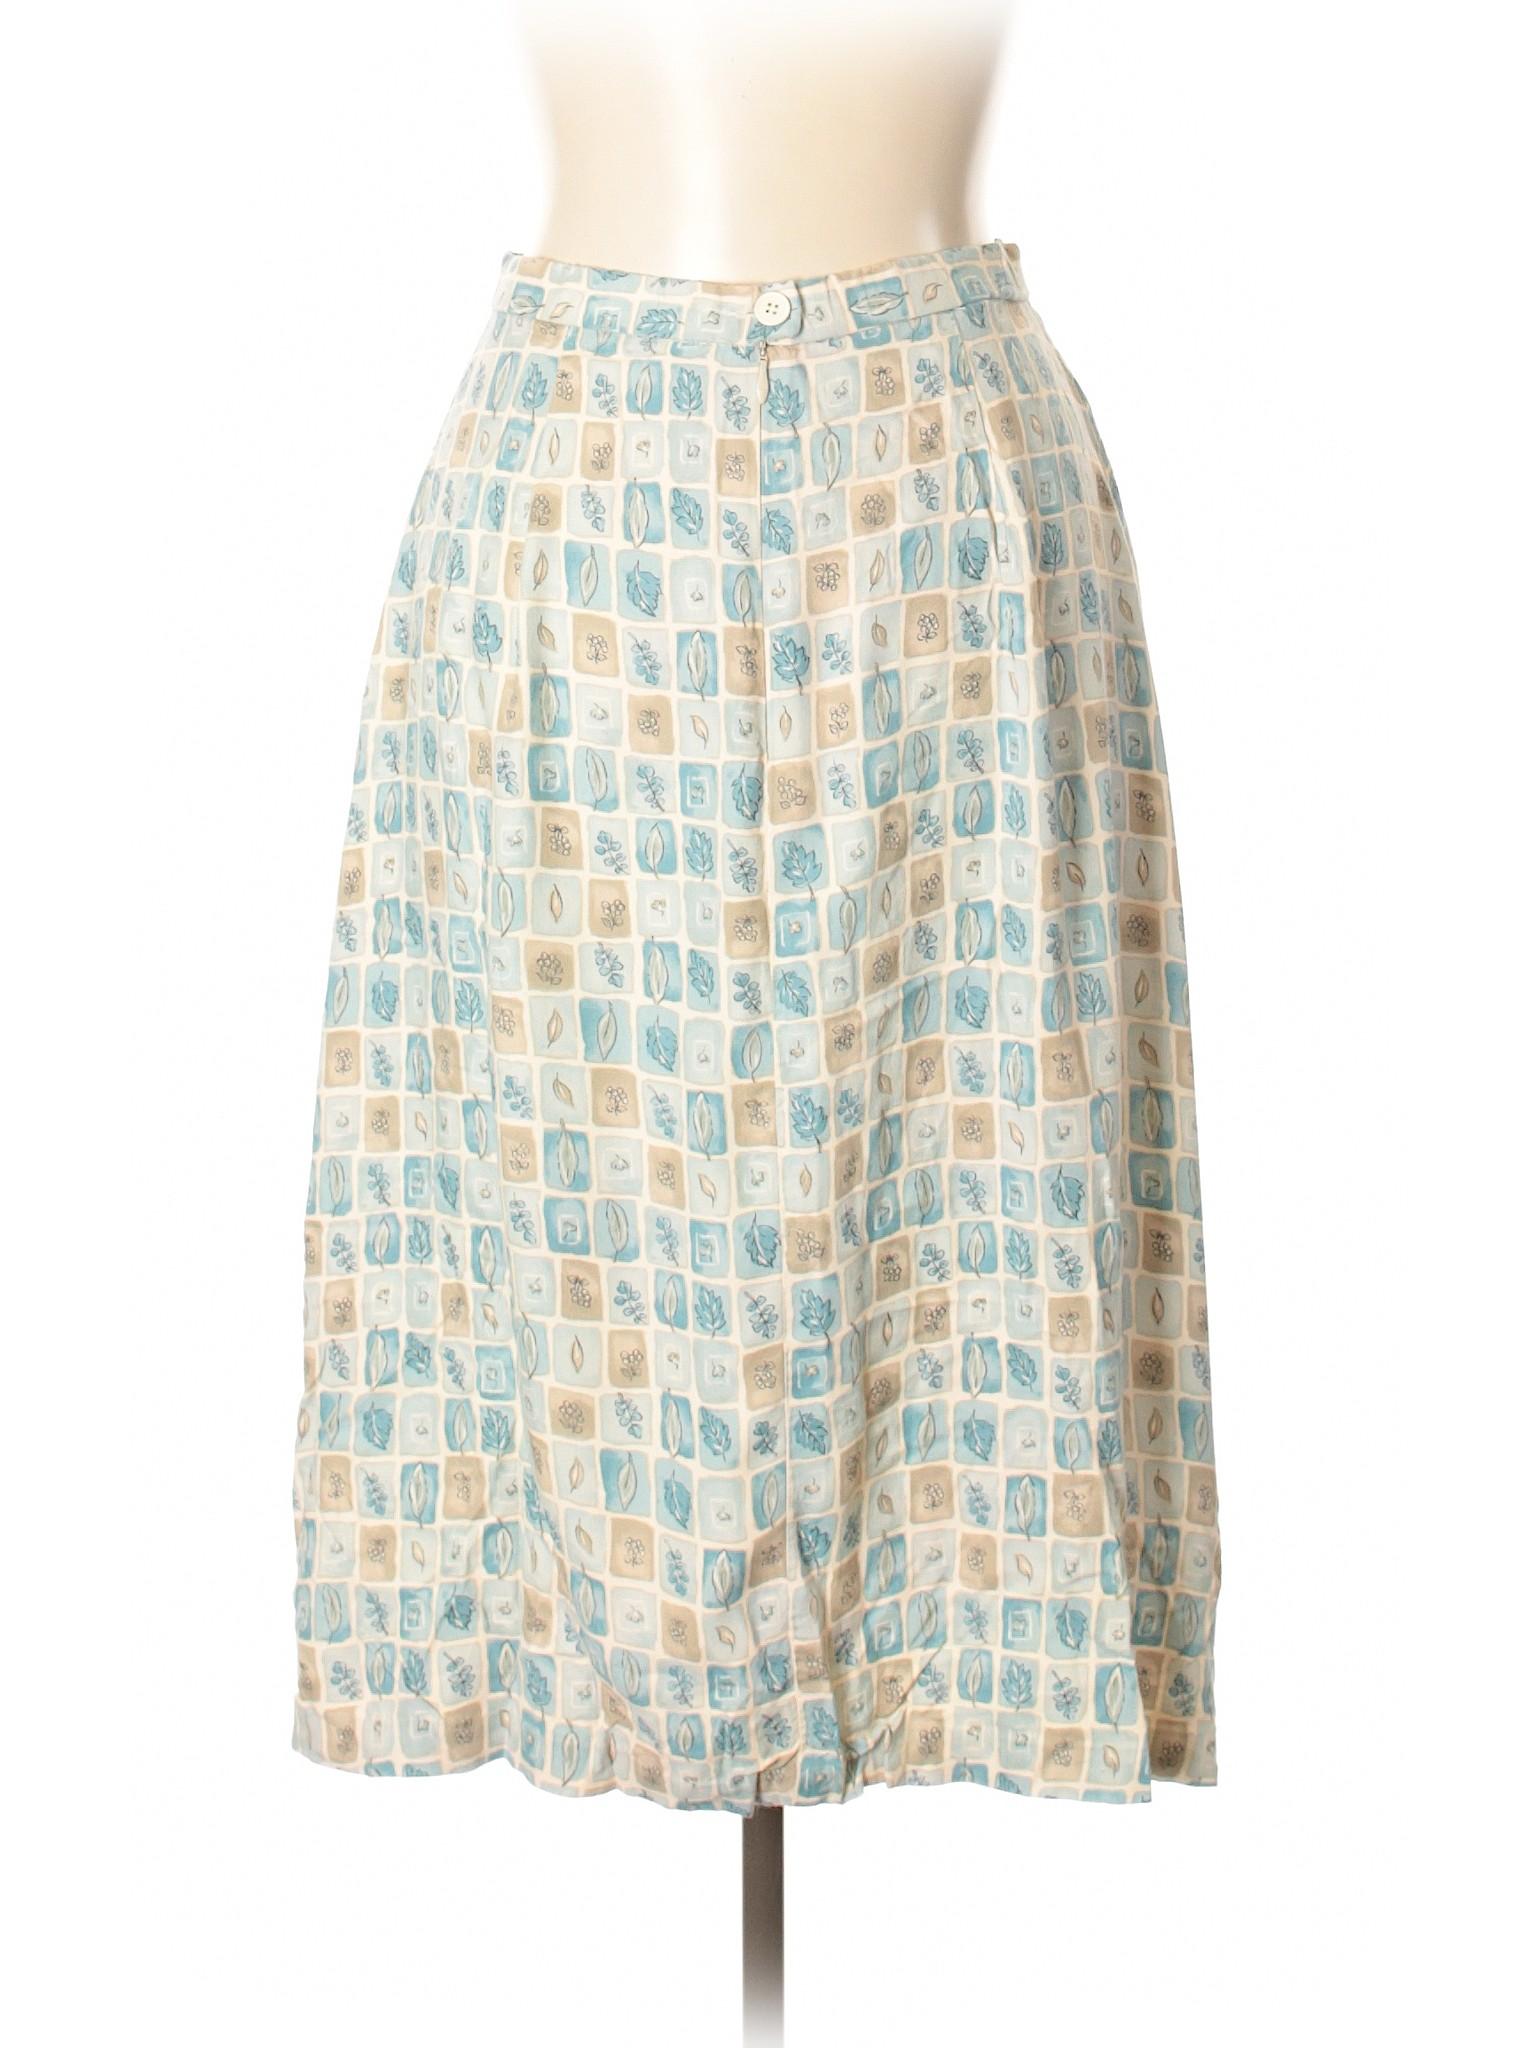 Casual Skirt Casual Boutique Skirt Skirt Boutique Boutique Boutique Casual 4pqRWXOw